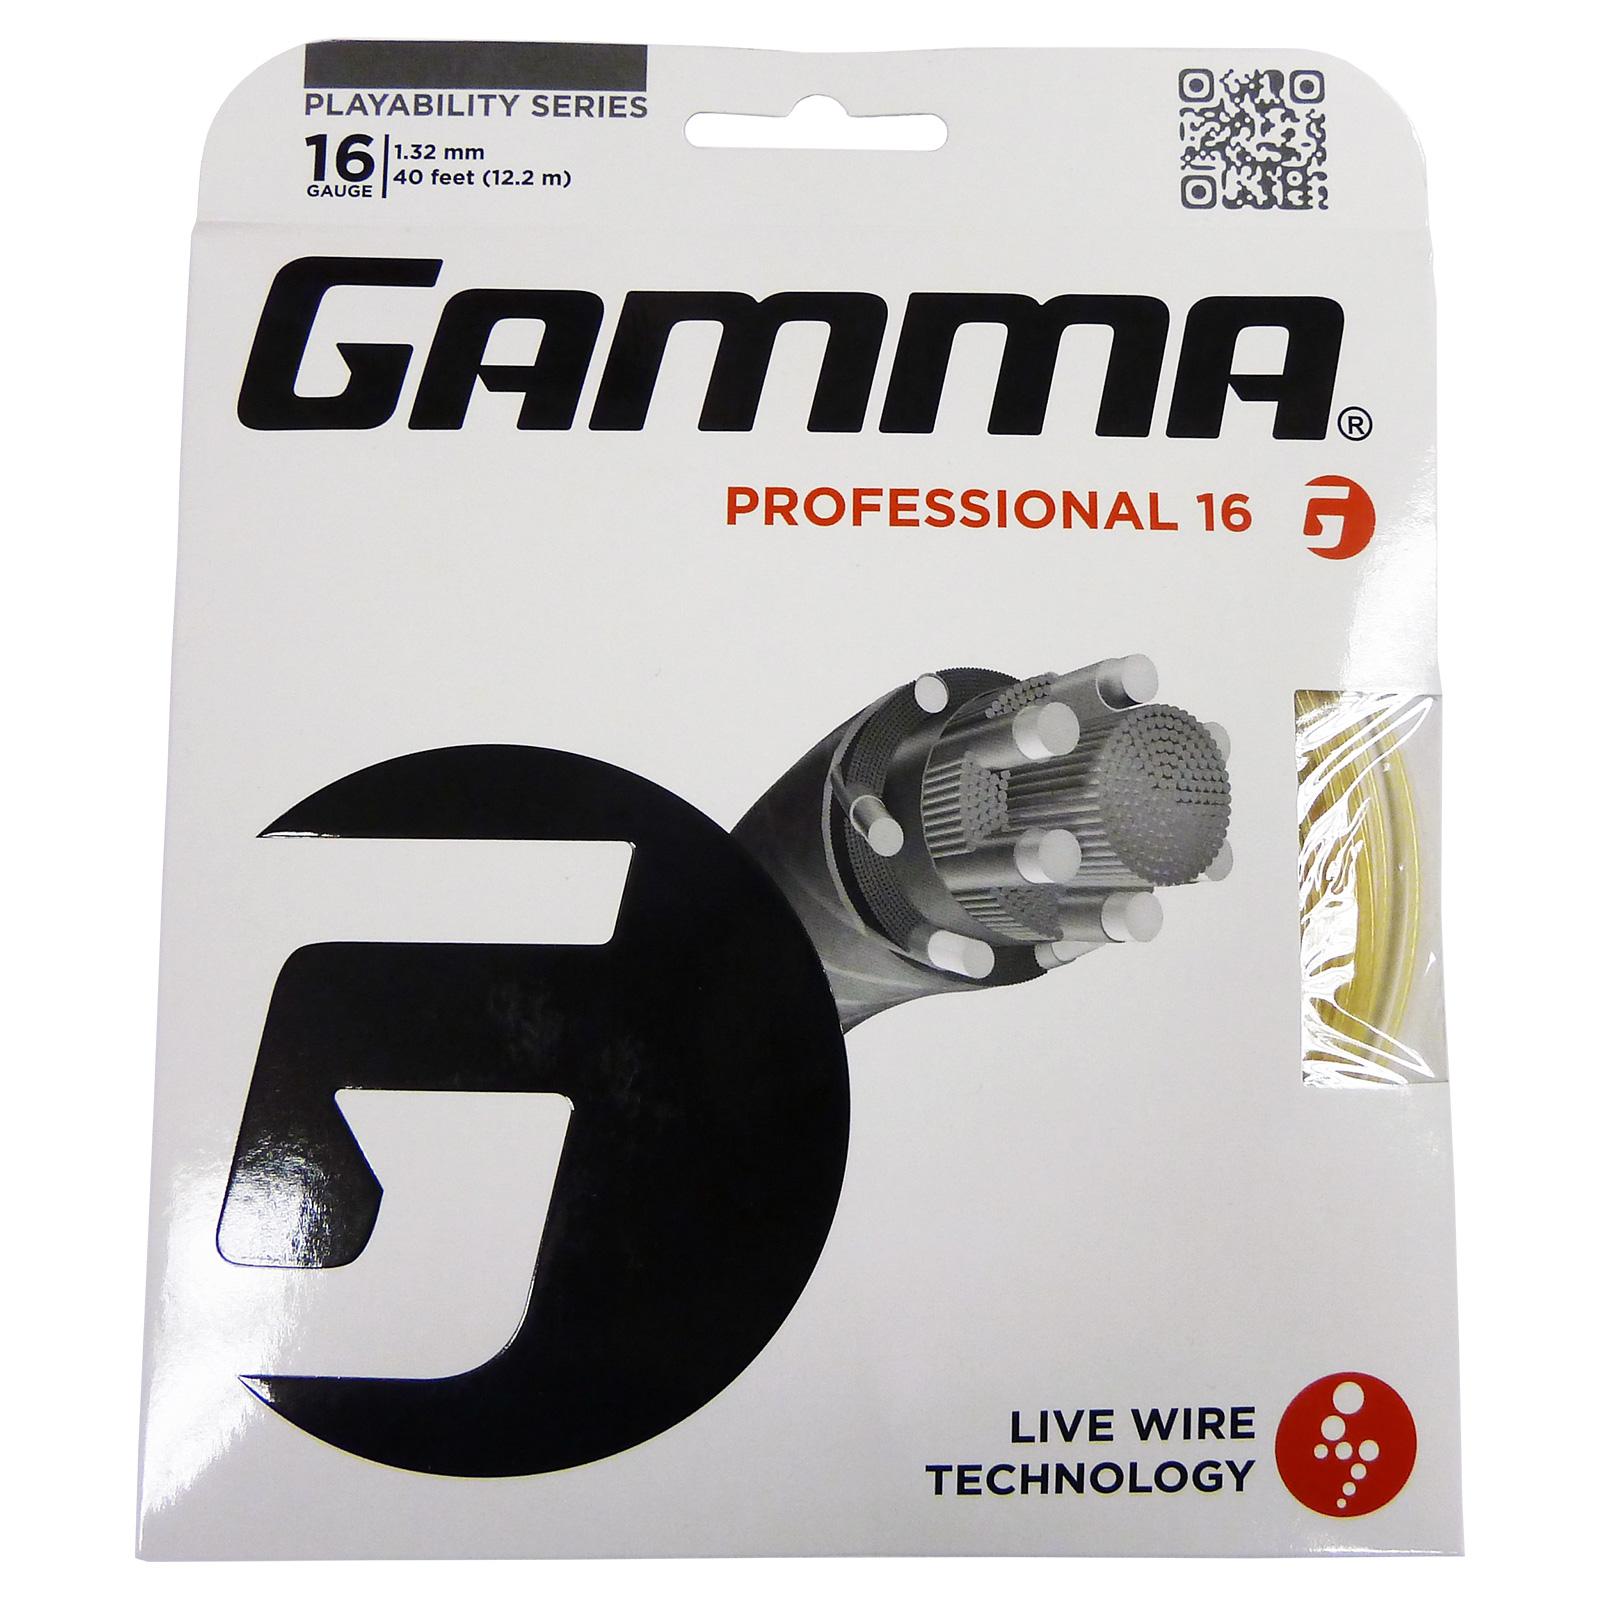 Gamma Live Wire Professional 1.32mm Tennis String Set